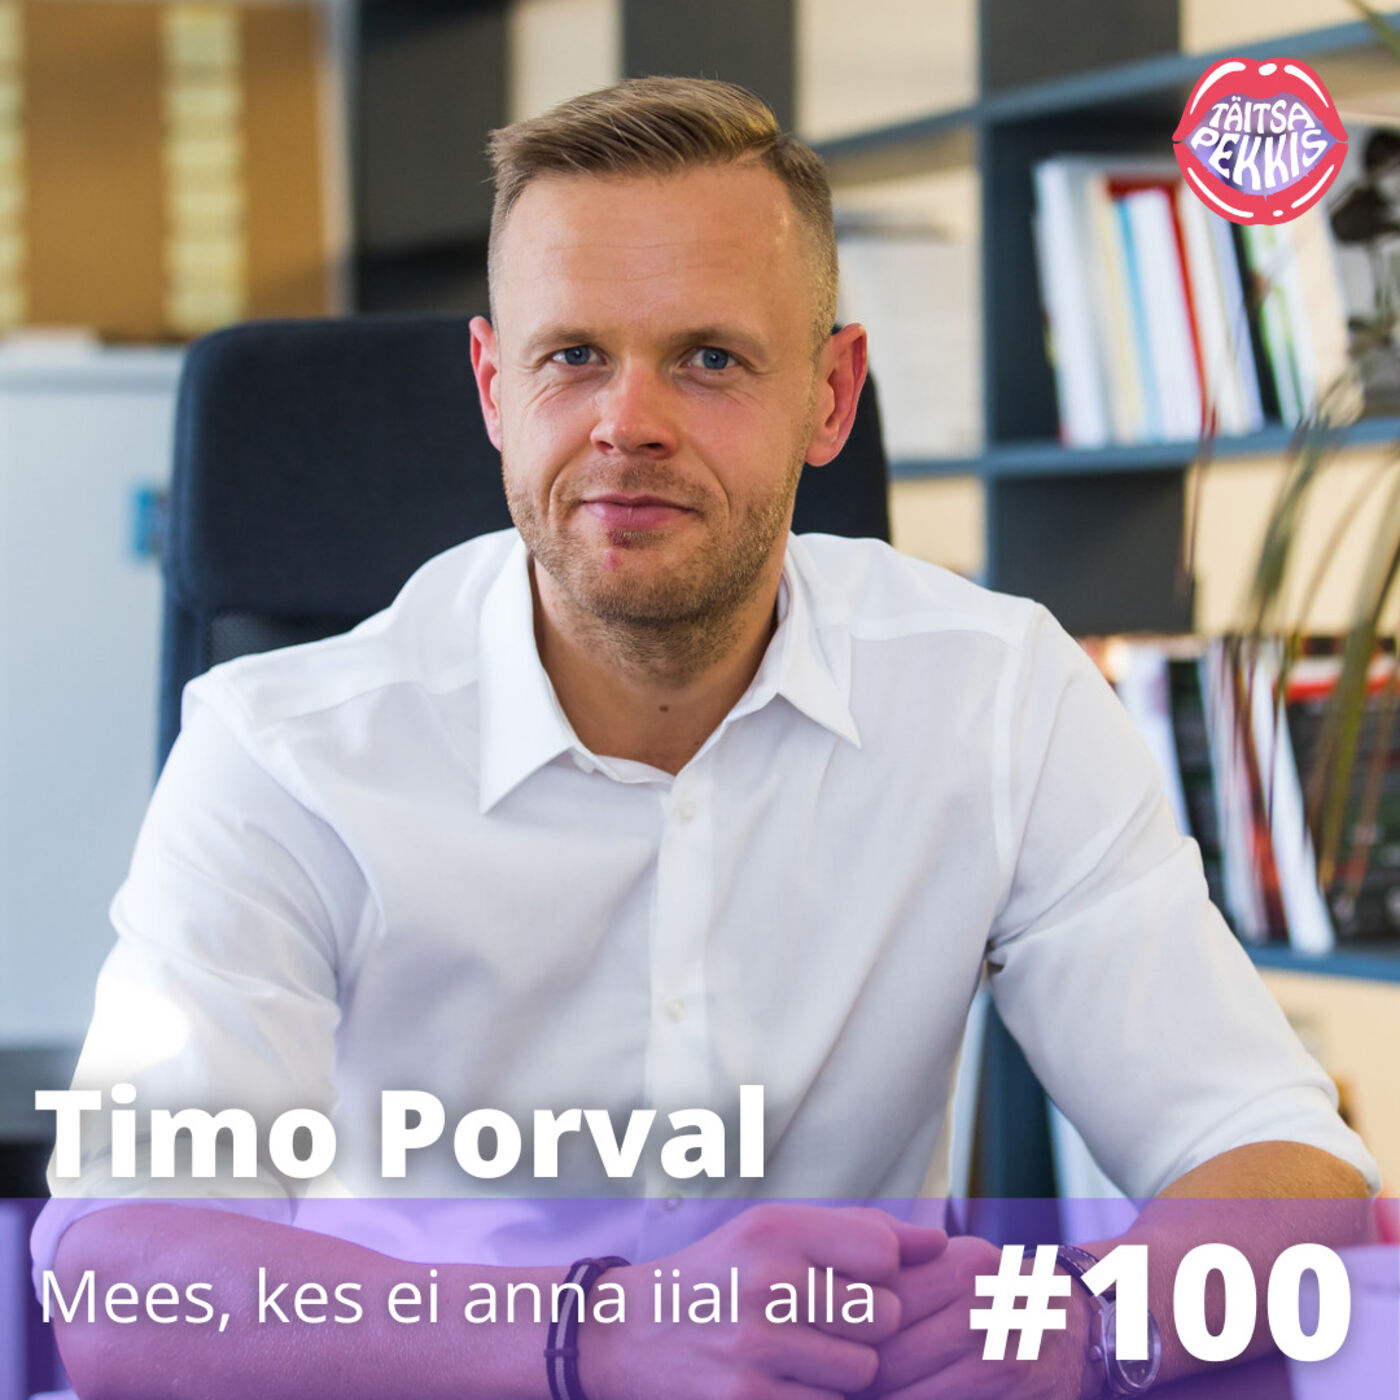 #100 - Timo Porval - Mees, kes ei anna iial alla